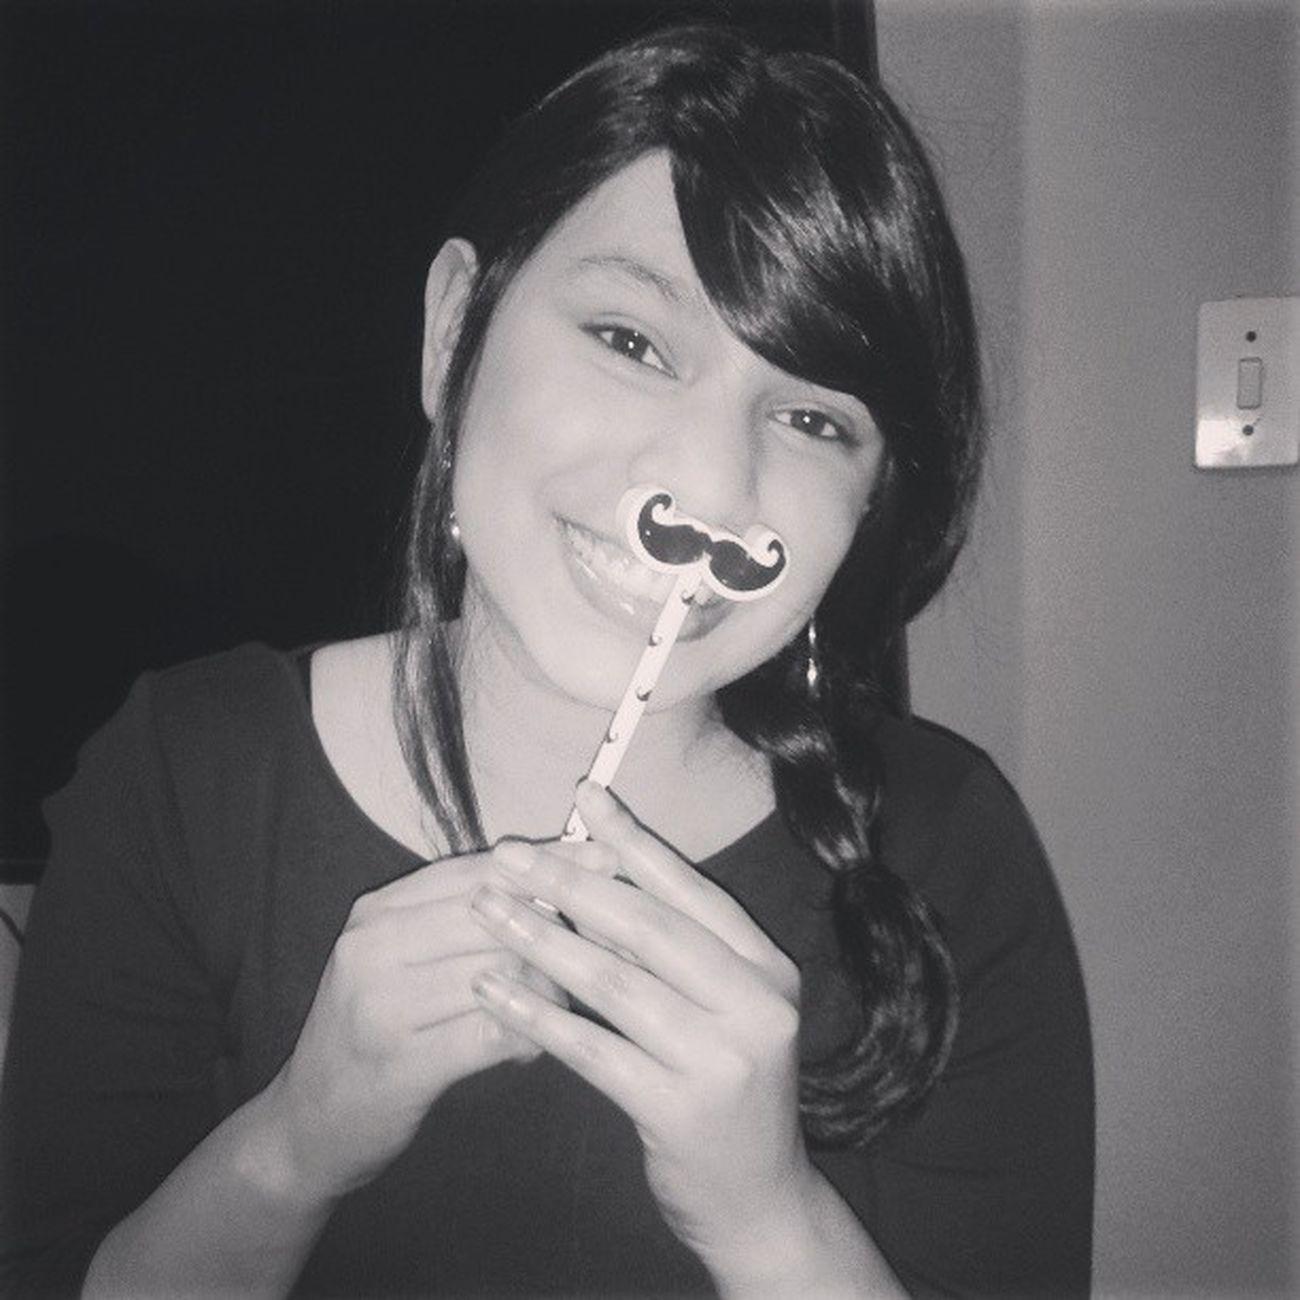 Mostachin Sonrisa